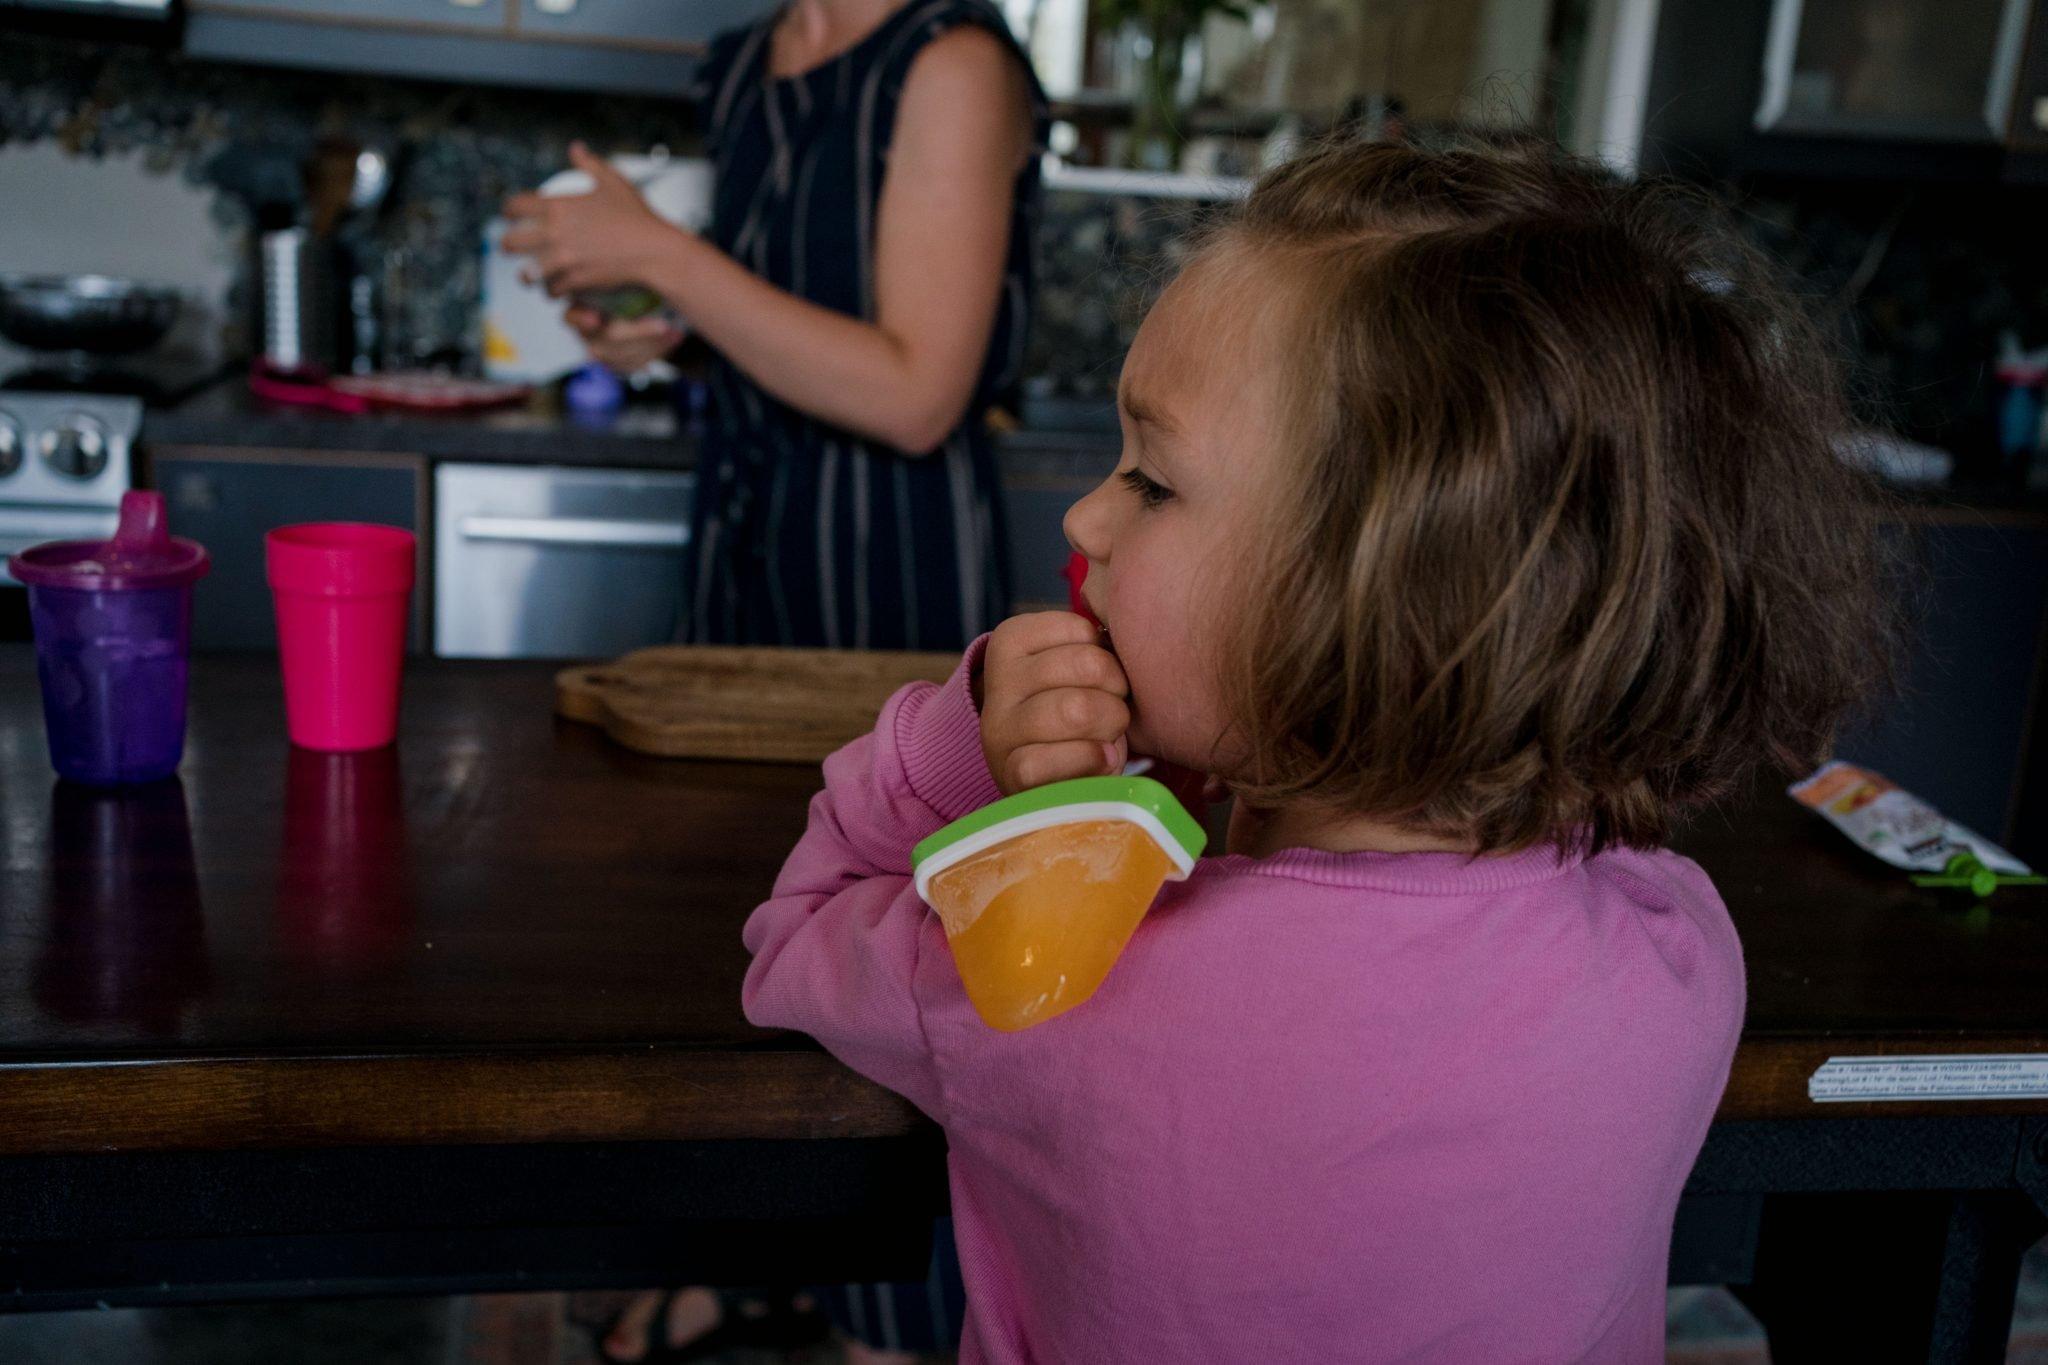 daughter with popsicle melting on shoulder